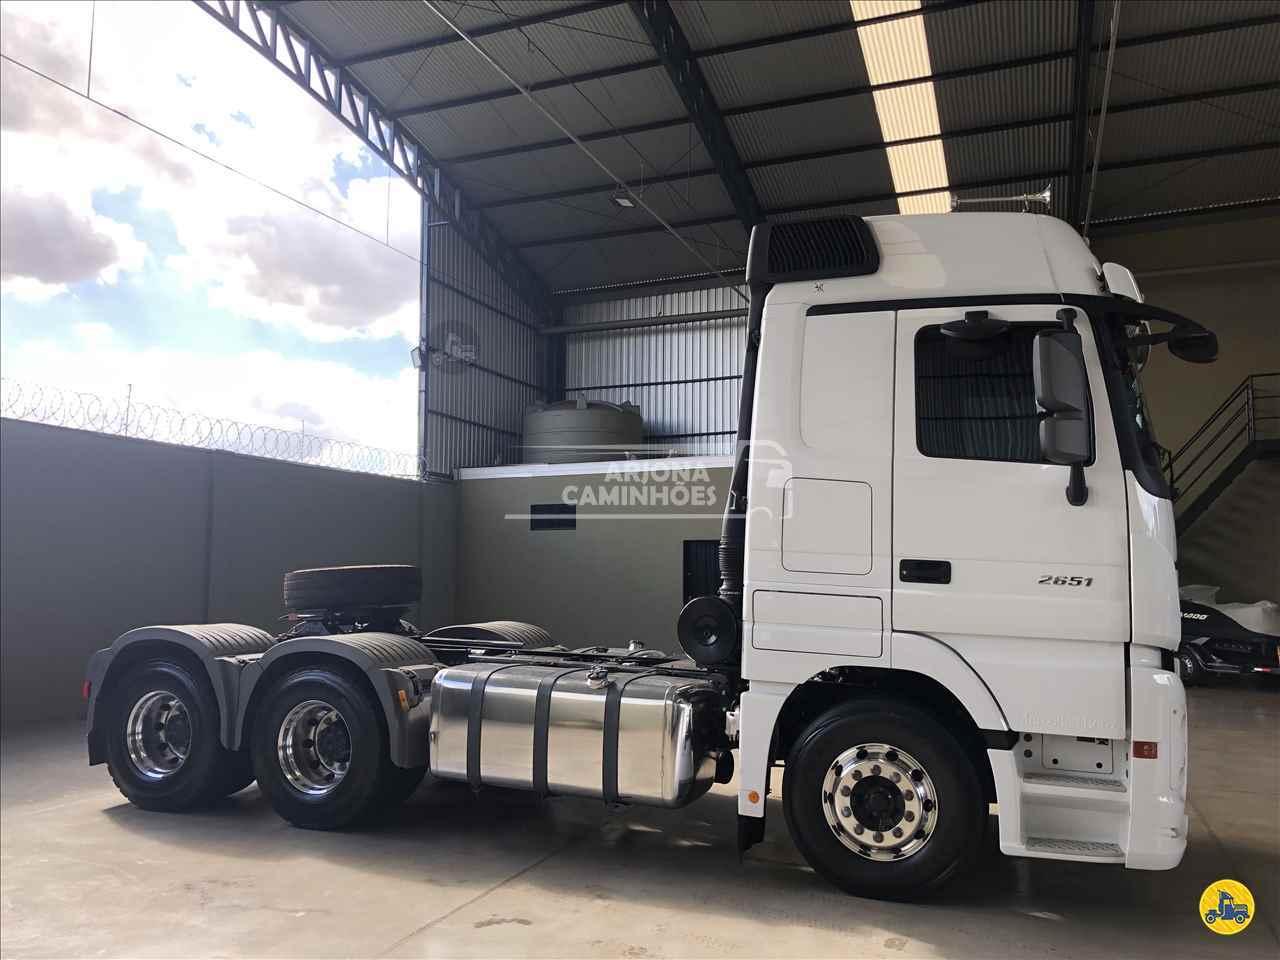 MERCEDES-BENZ MB 2651 200000km 2018/2019 Arjona Caminhões